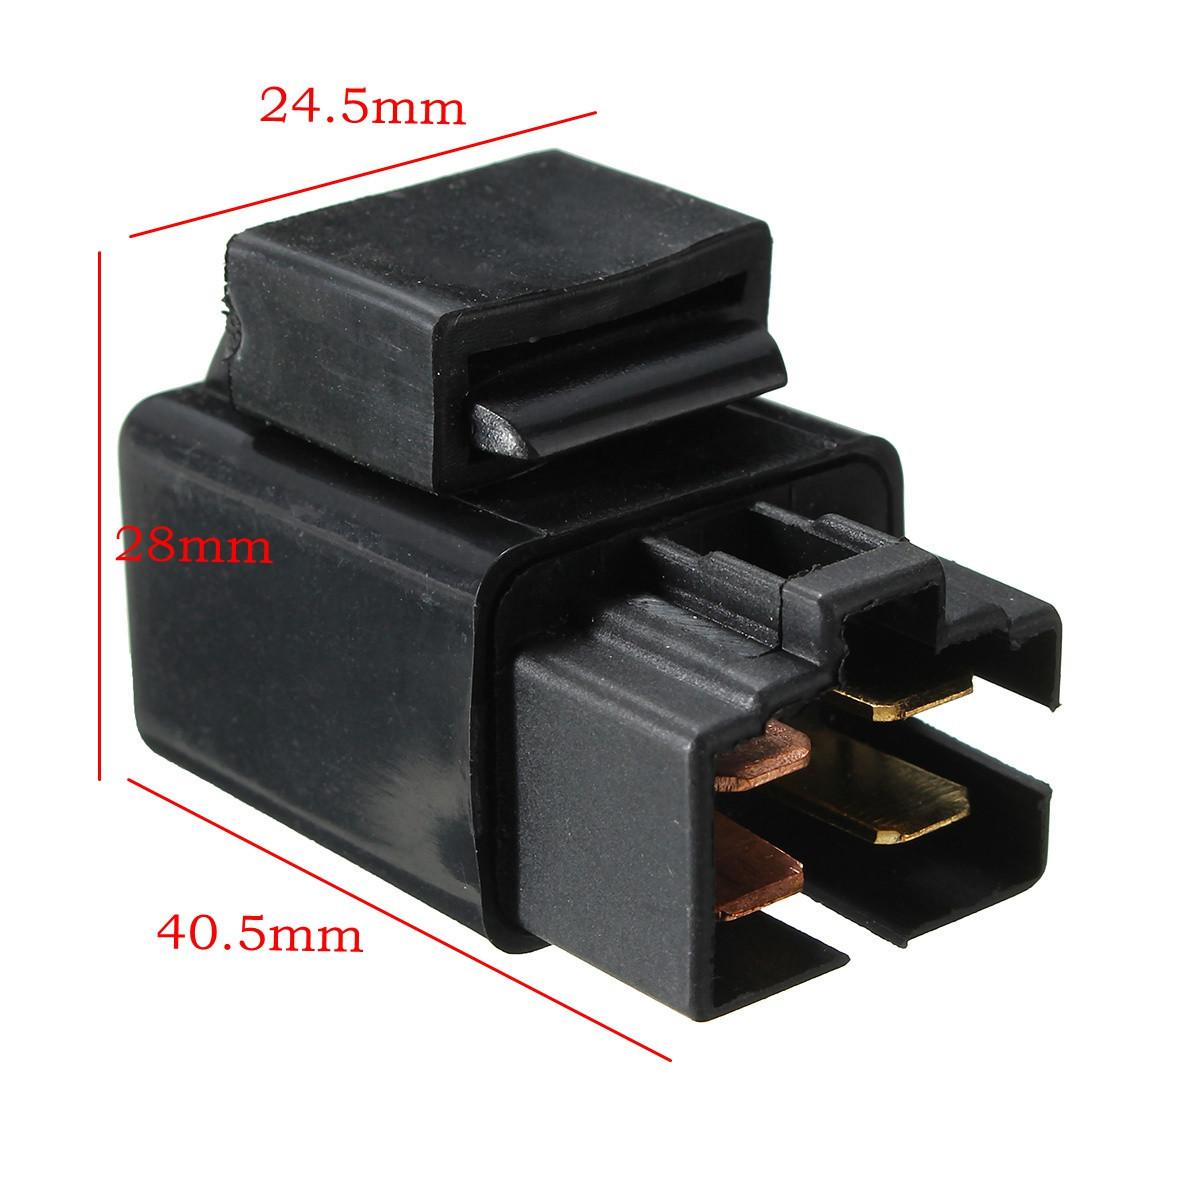 Suzuki Gsx1400 Fuel Pump Control System Wiring And Circuit Diagram